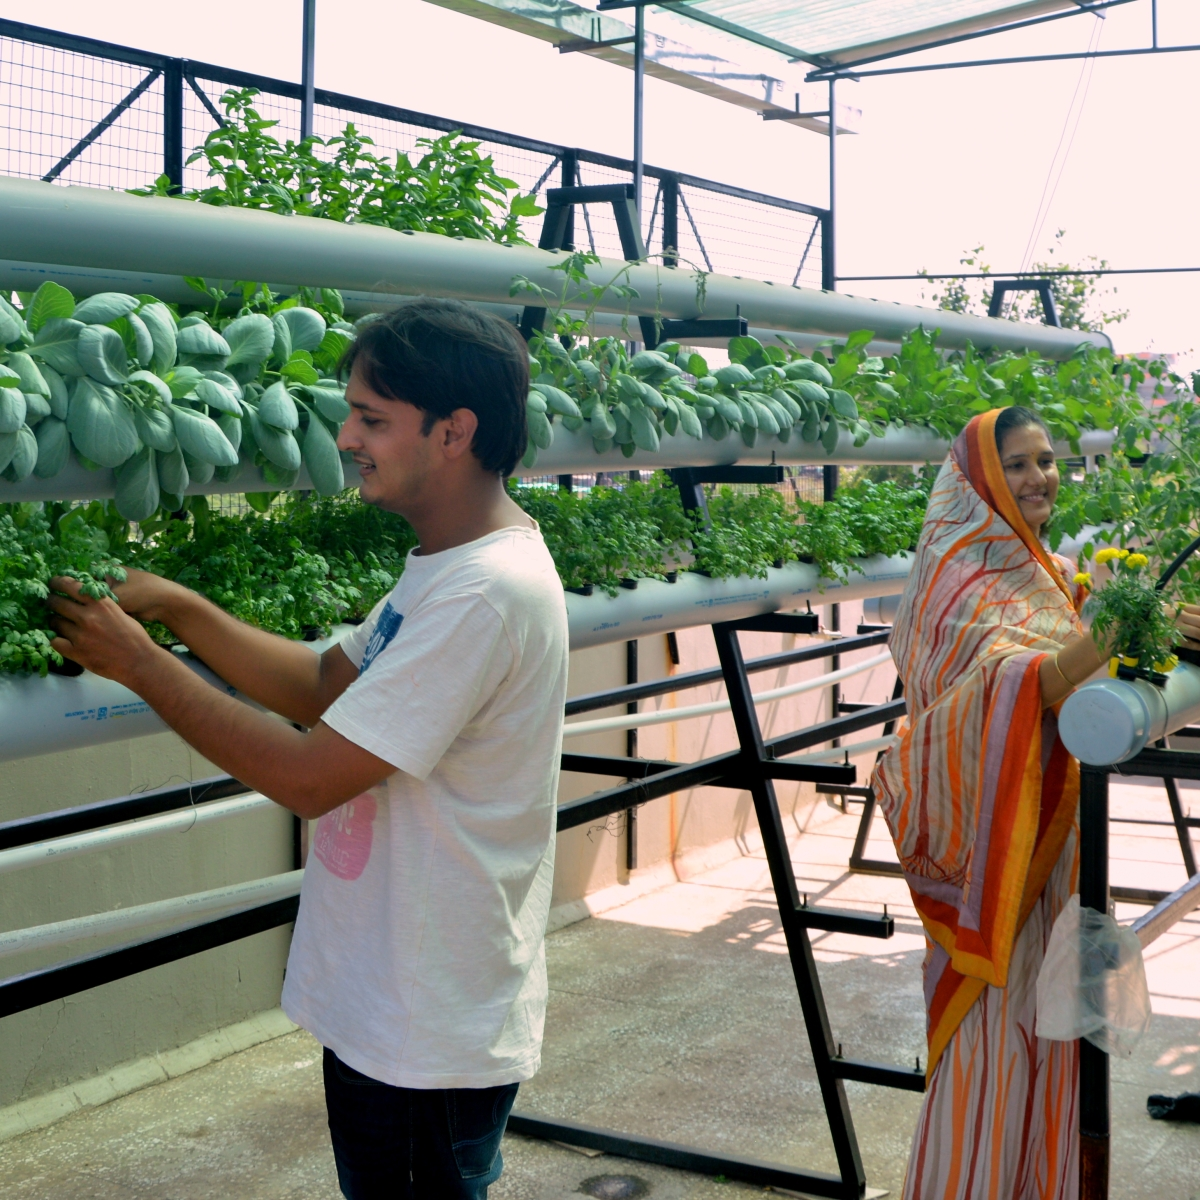 Madhya Pradesh: This couple is growing vegetables in water